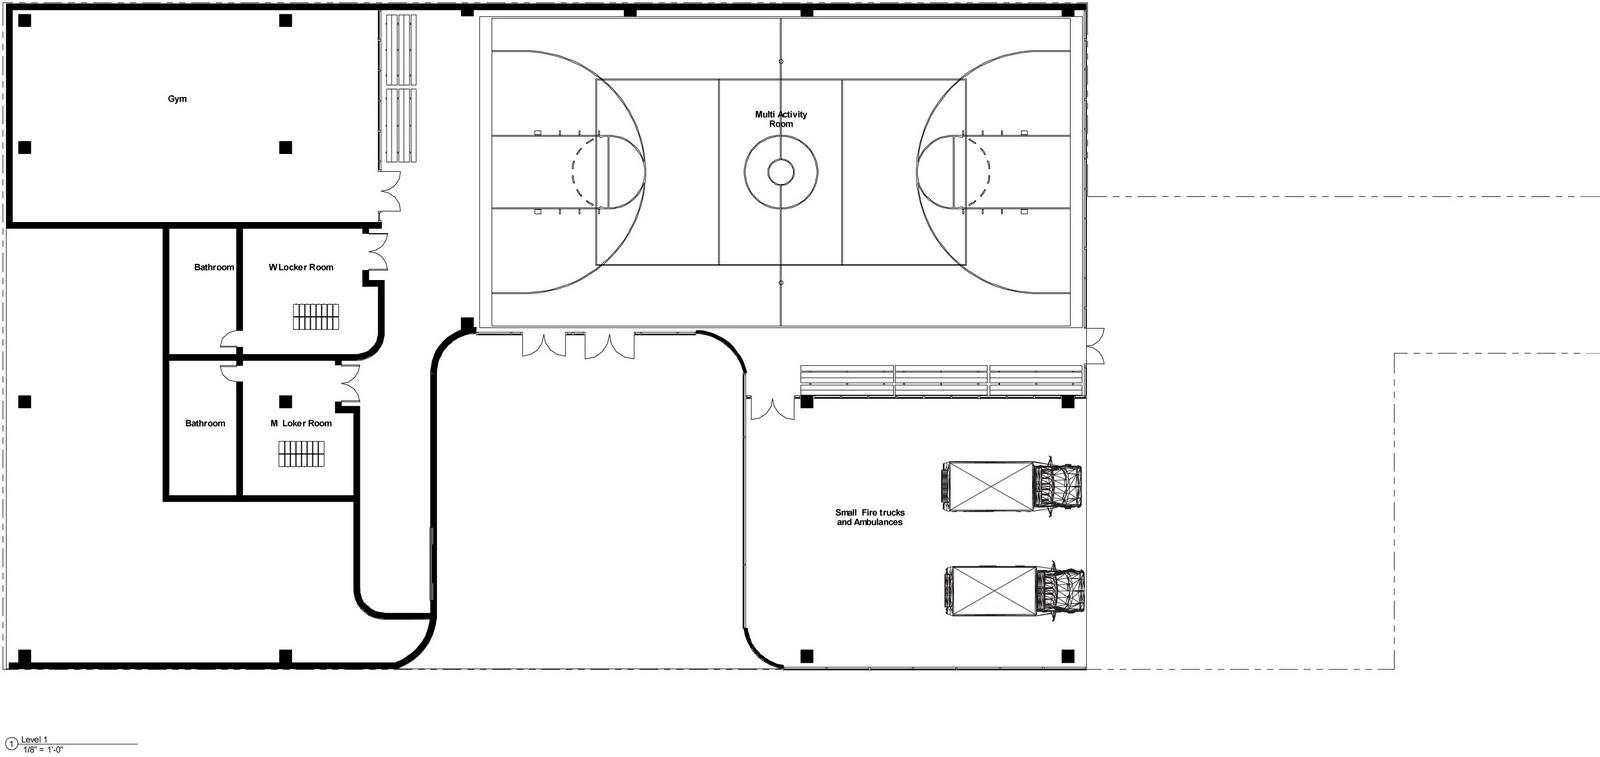 Arch 3611 Theoretical Design